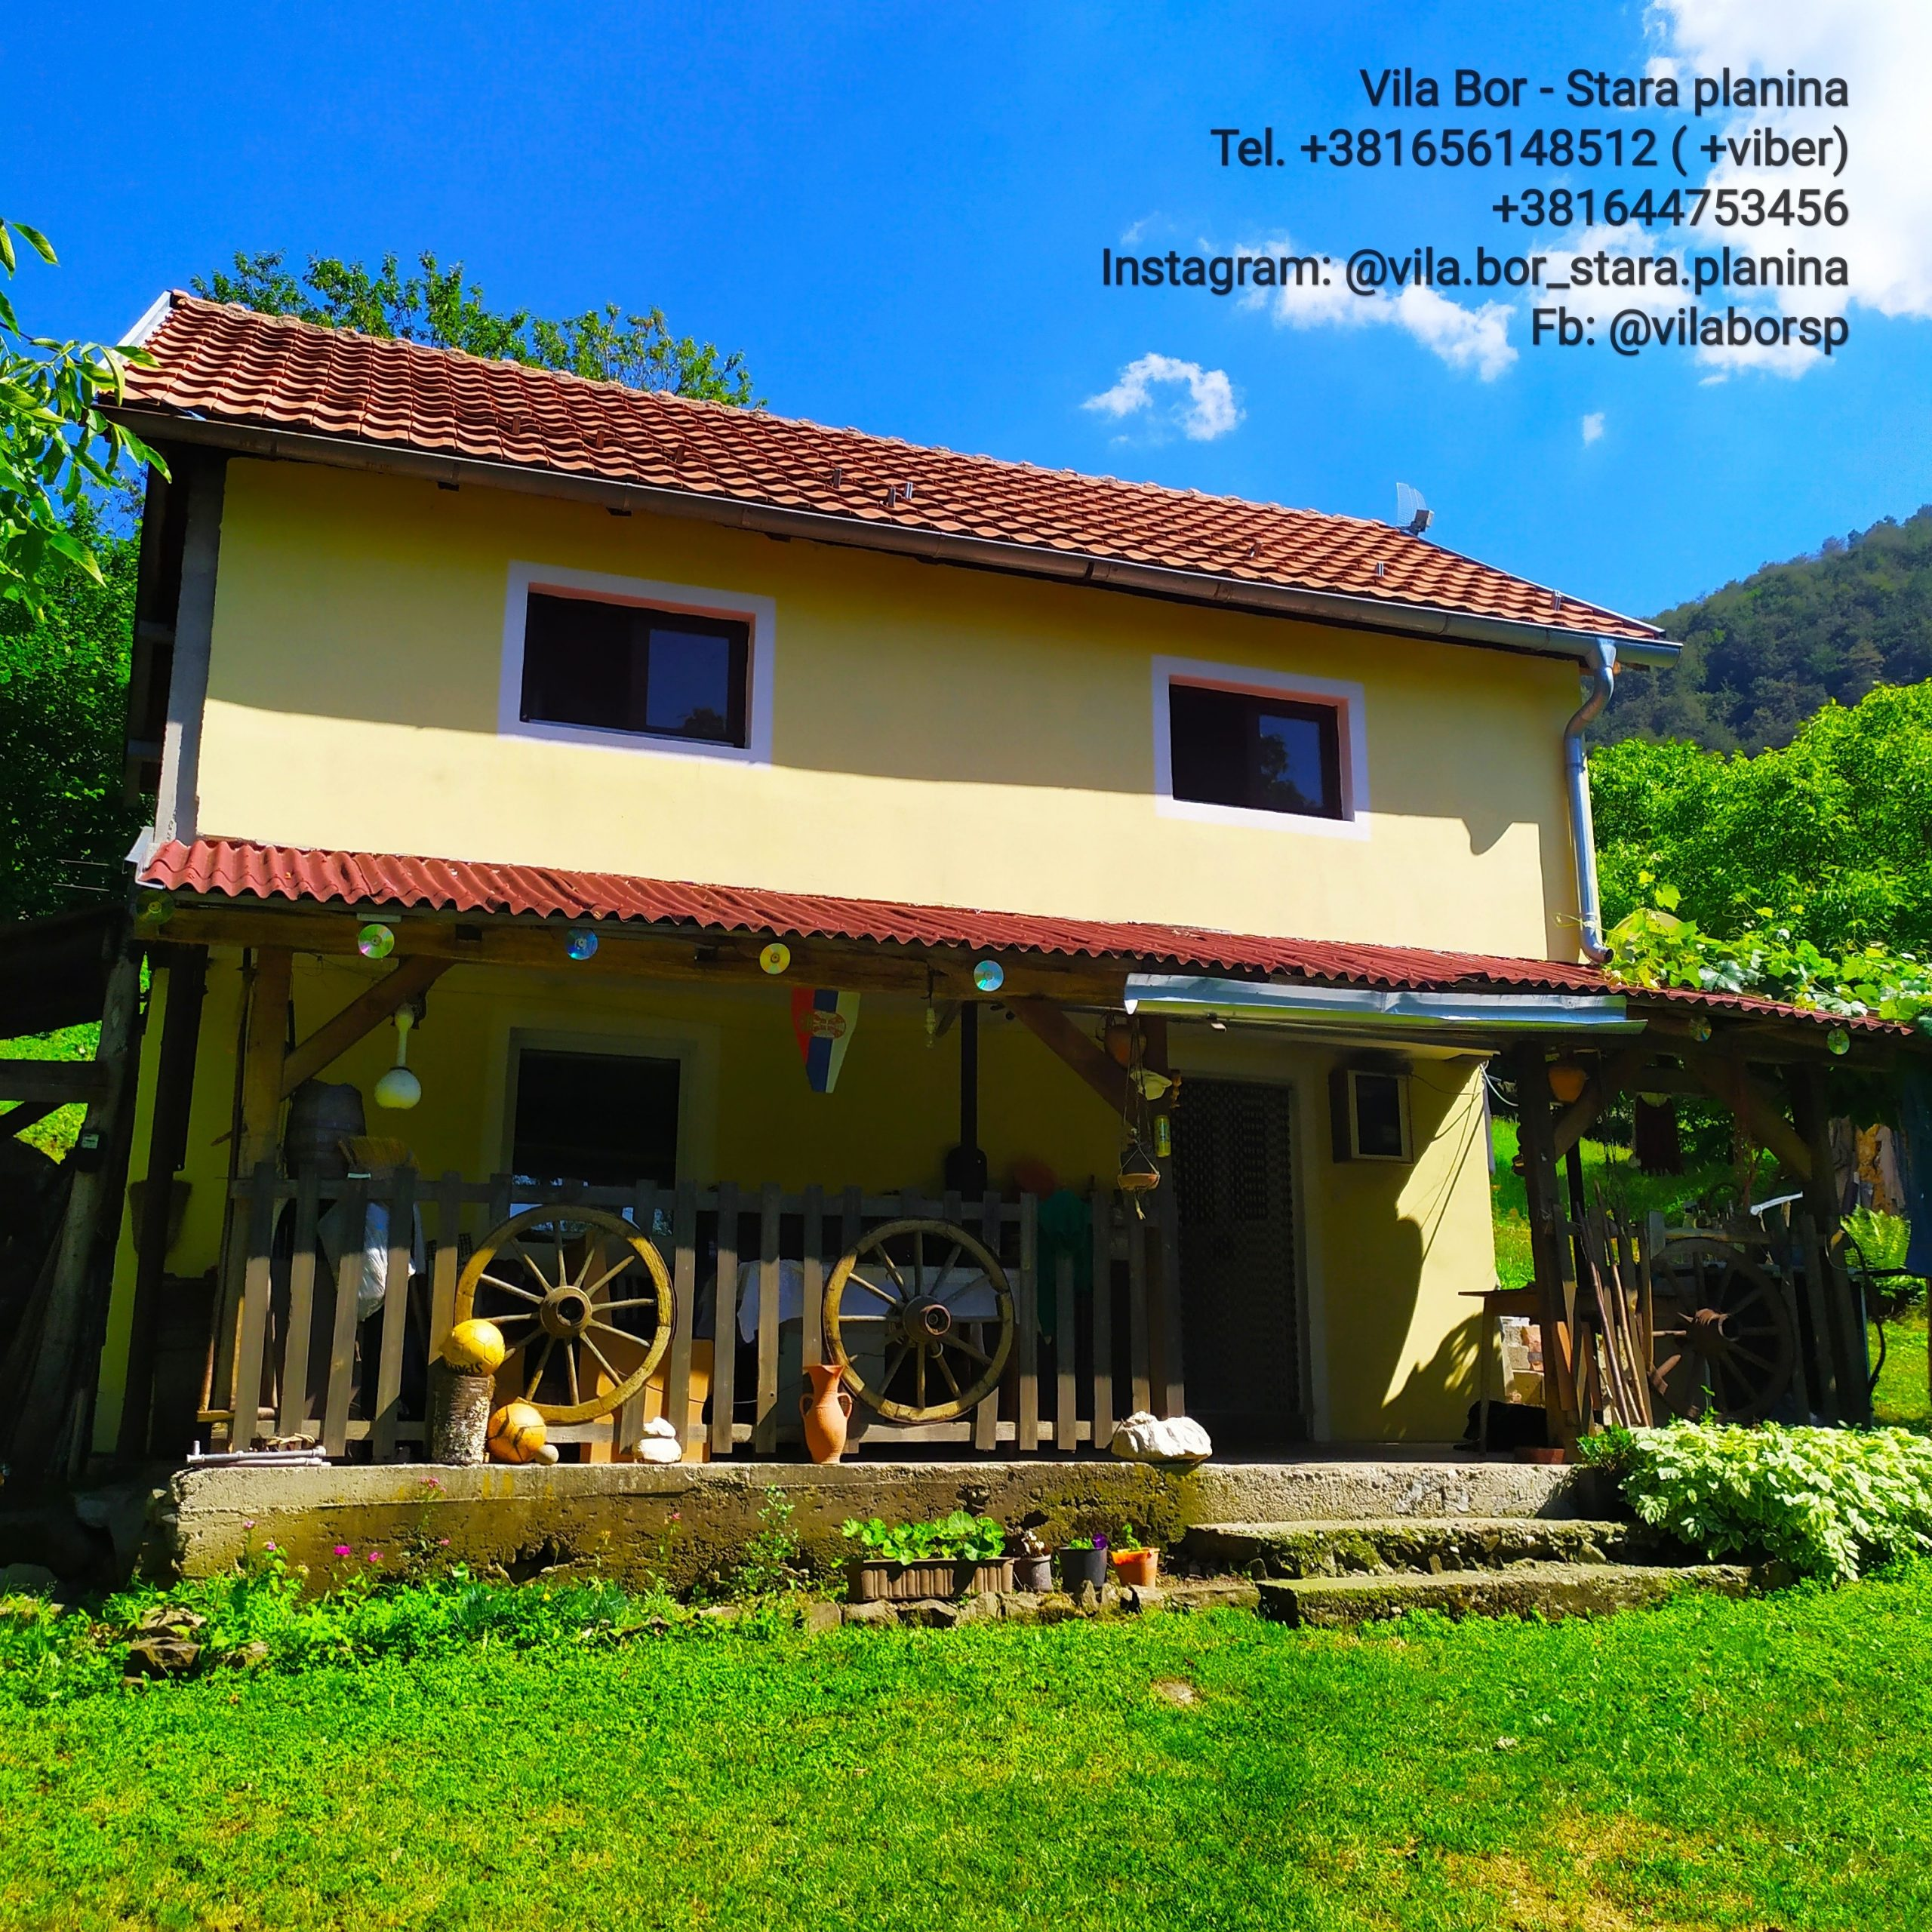 Vila Bor – Crni Vrh – Stara planina